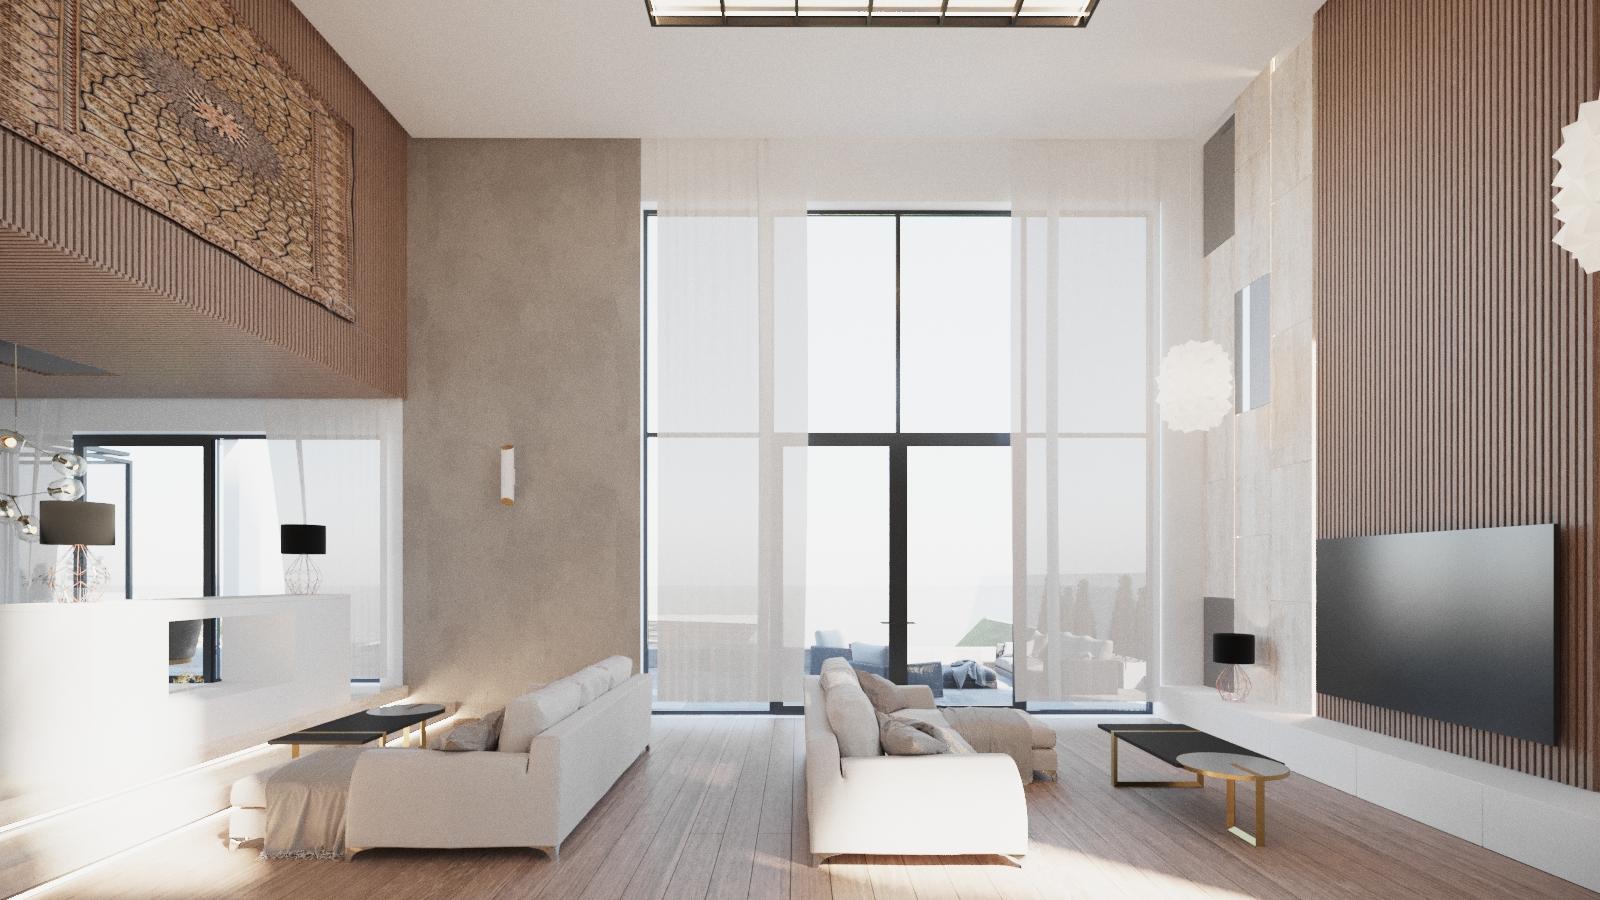 https://nbc-arhitect.ro/wp-content/uploads/2020/10/NBC-Arhitect-_-residences-_-Mogo-Villa-_-Romania-_-interior-view_17.jpg